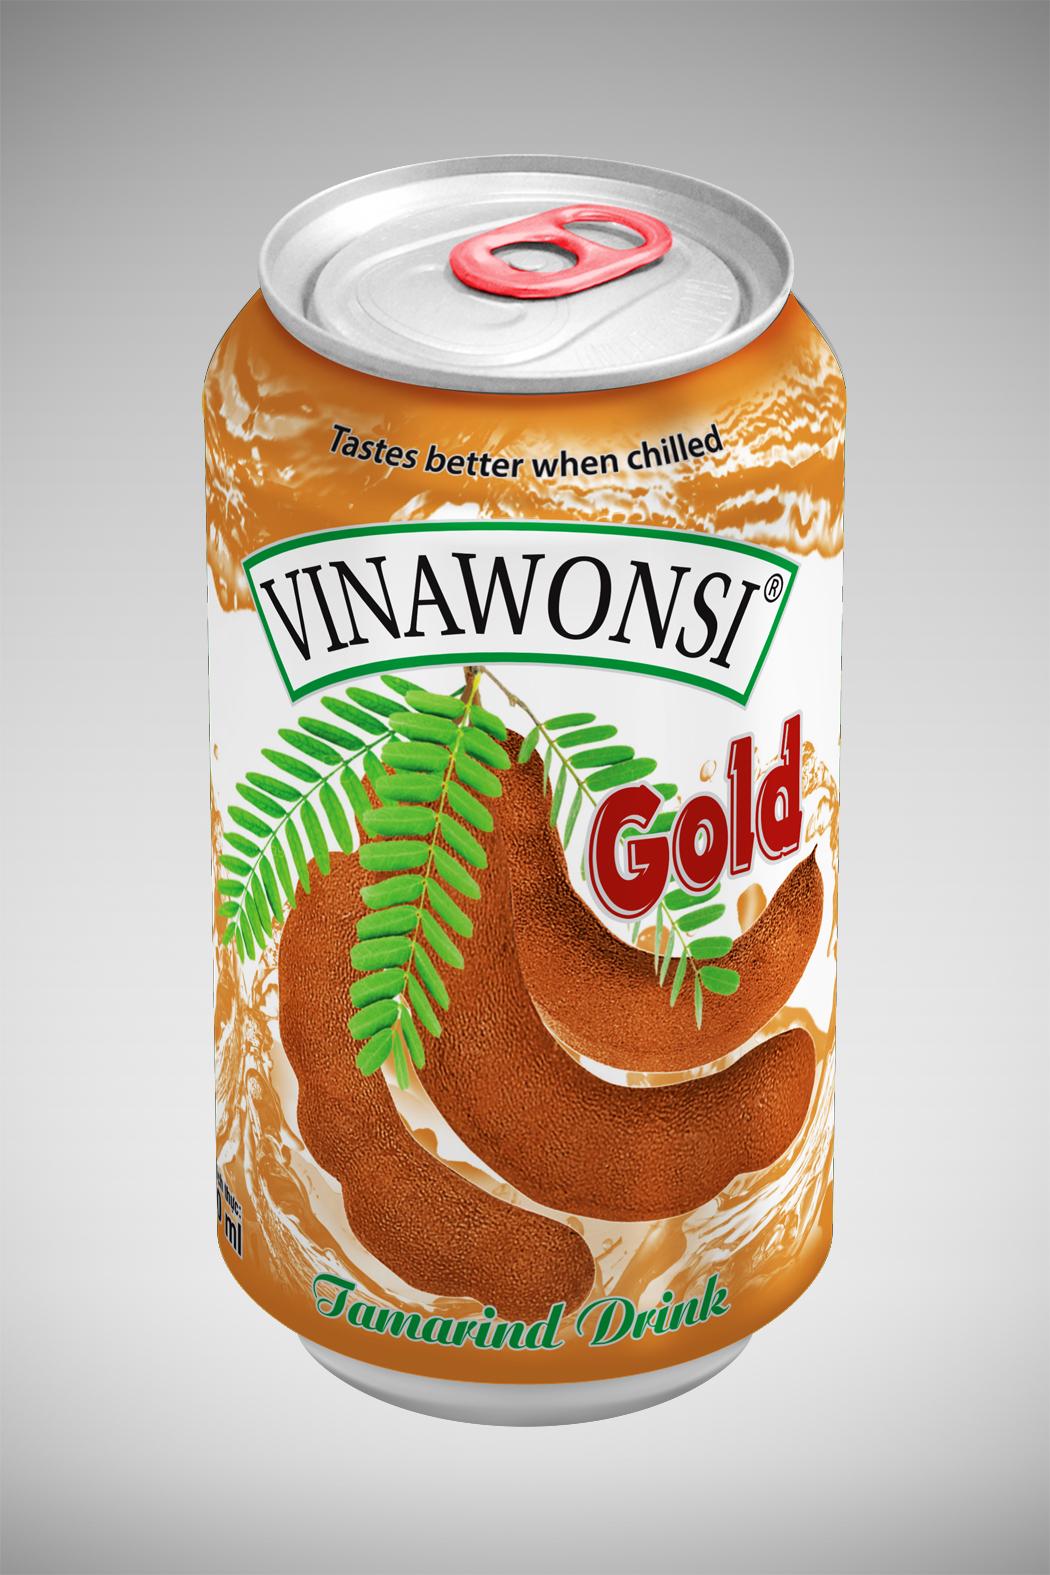 Nước me Vinawonsi Gold